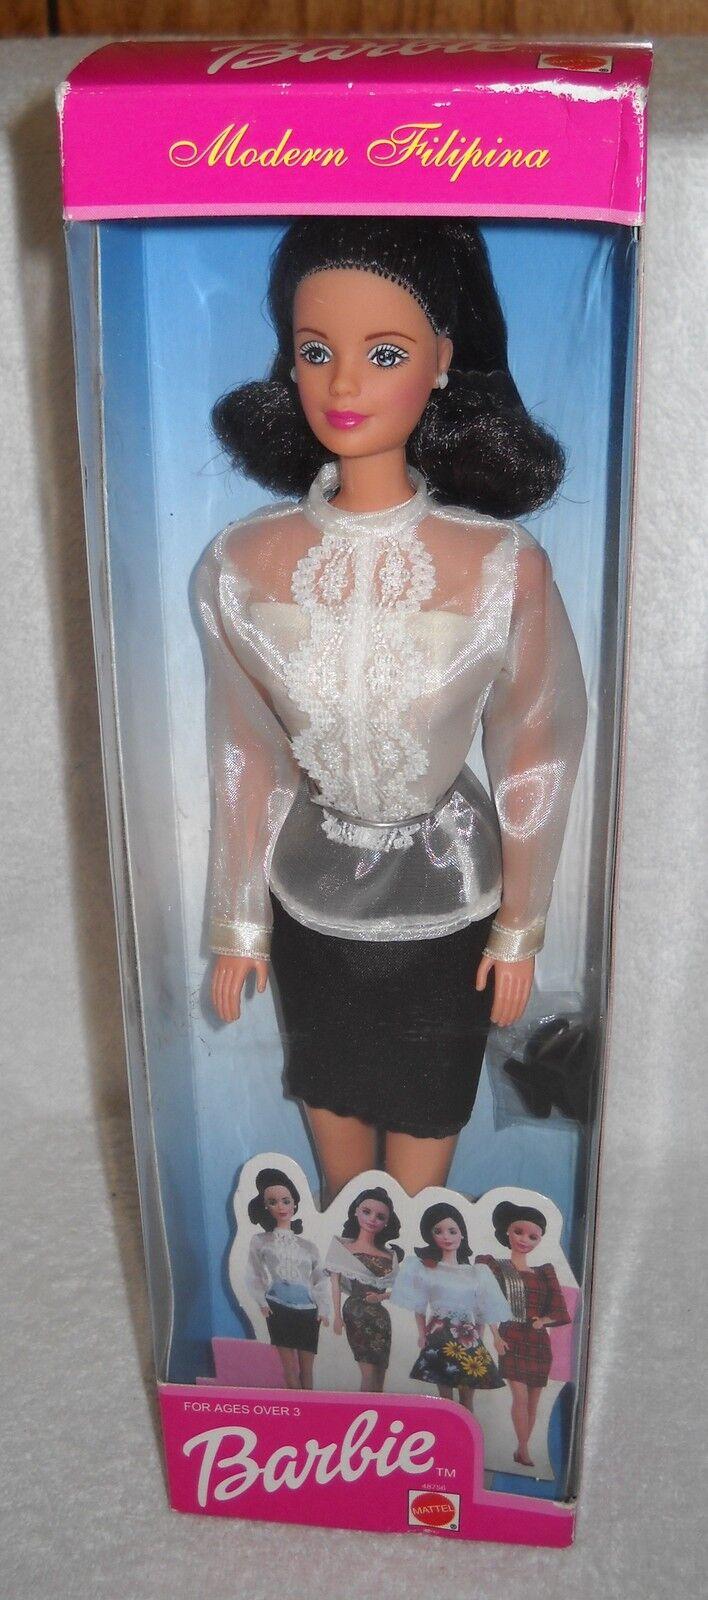 Nrfb Mattel Filipinas Moderno filipina Barbie Exterior